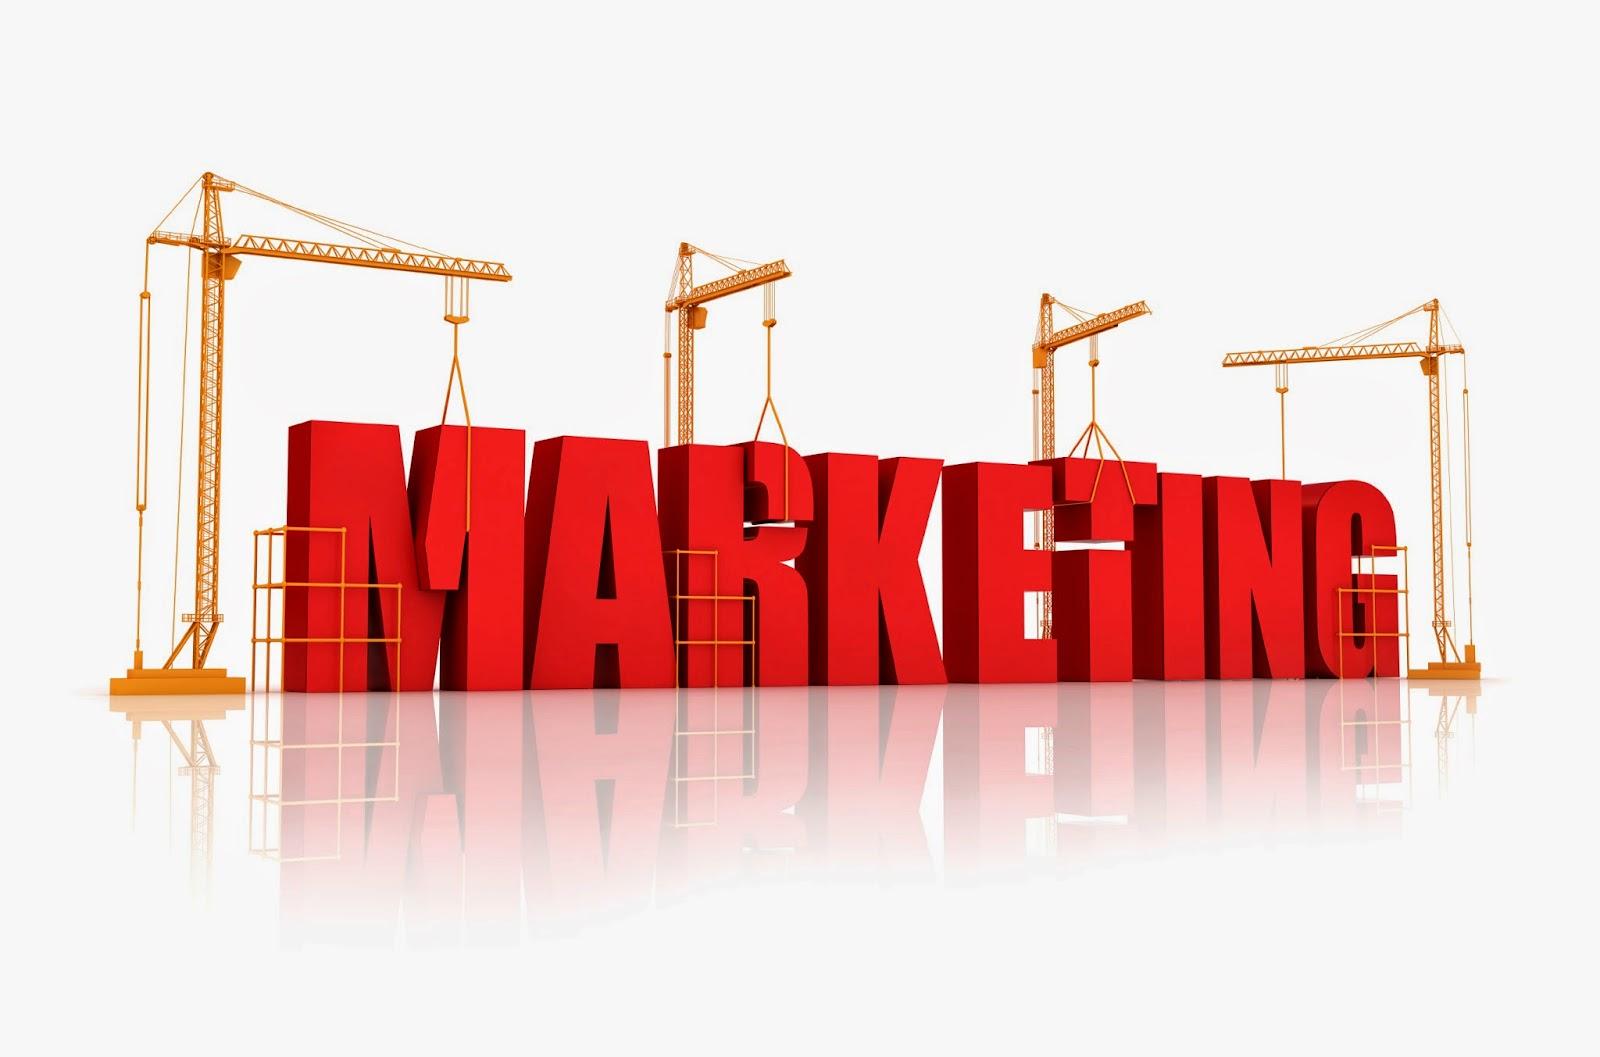 Rahasia Membuat Artikel Internet Marketing Dengan Mudah